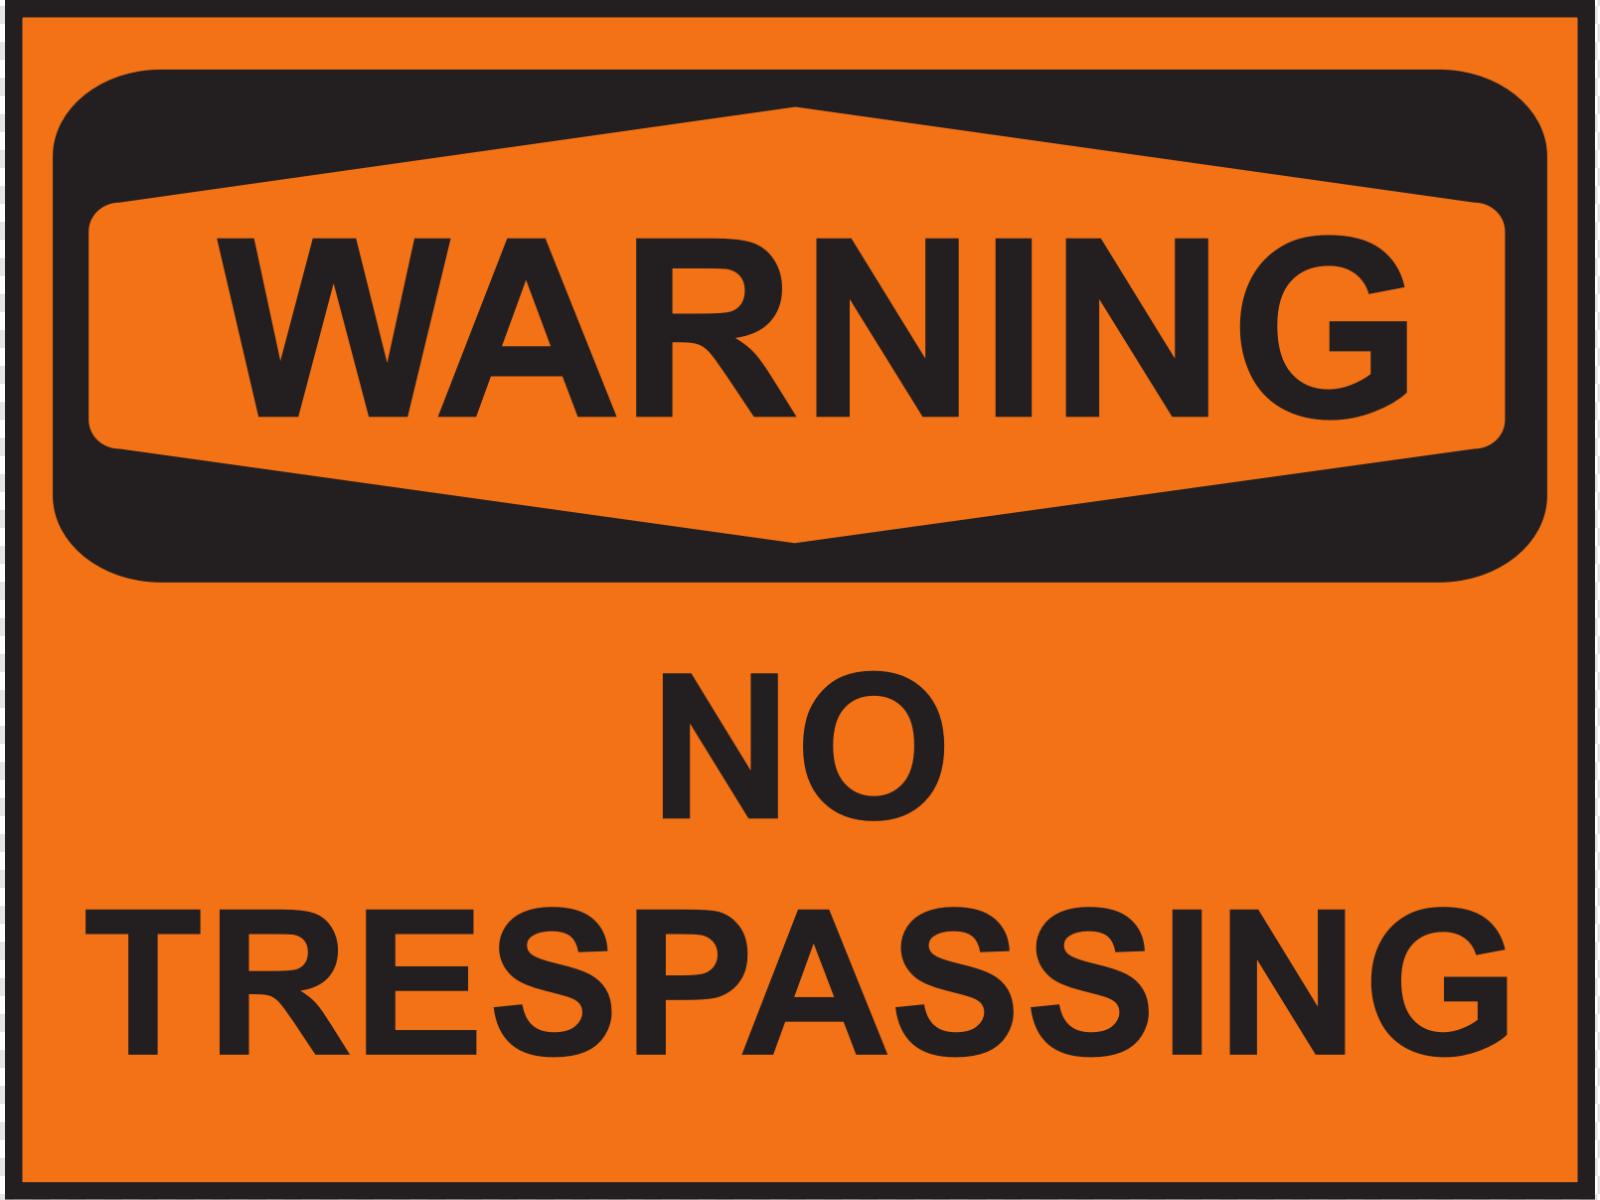 No trespassing sign clipart clip freeuse Warning No Trespassing Clip art, Icon and SVG - SVG Clipart clip freeuse